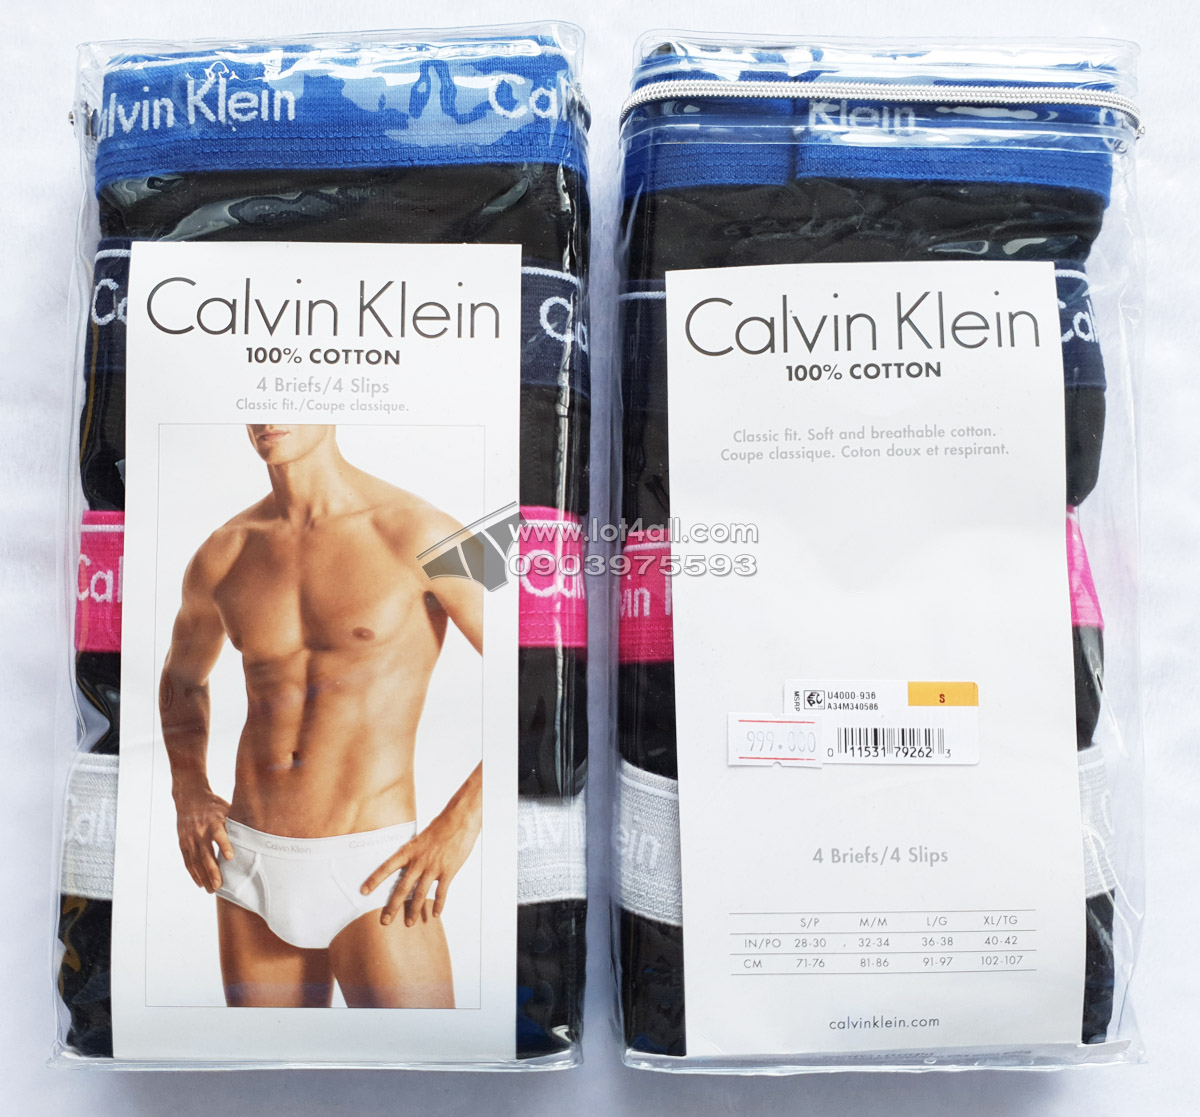 Quần lót Calvin Klein U4000 Cotton Classic Brief 4-pack Black